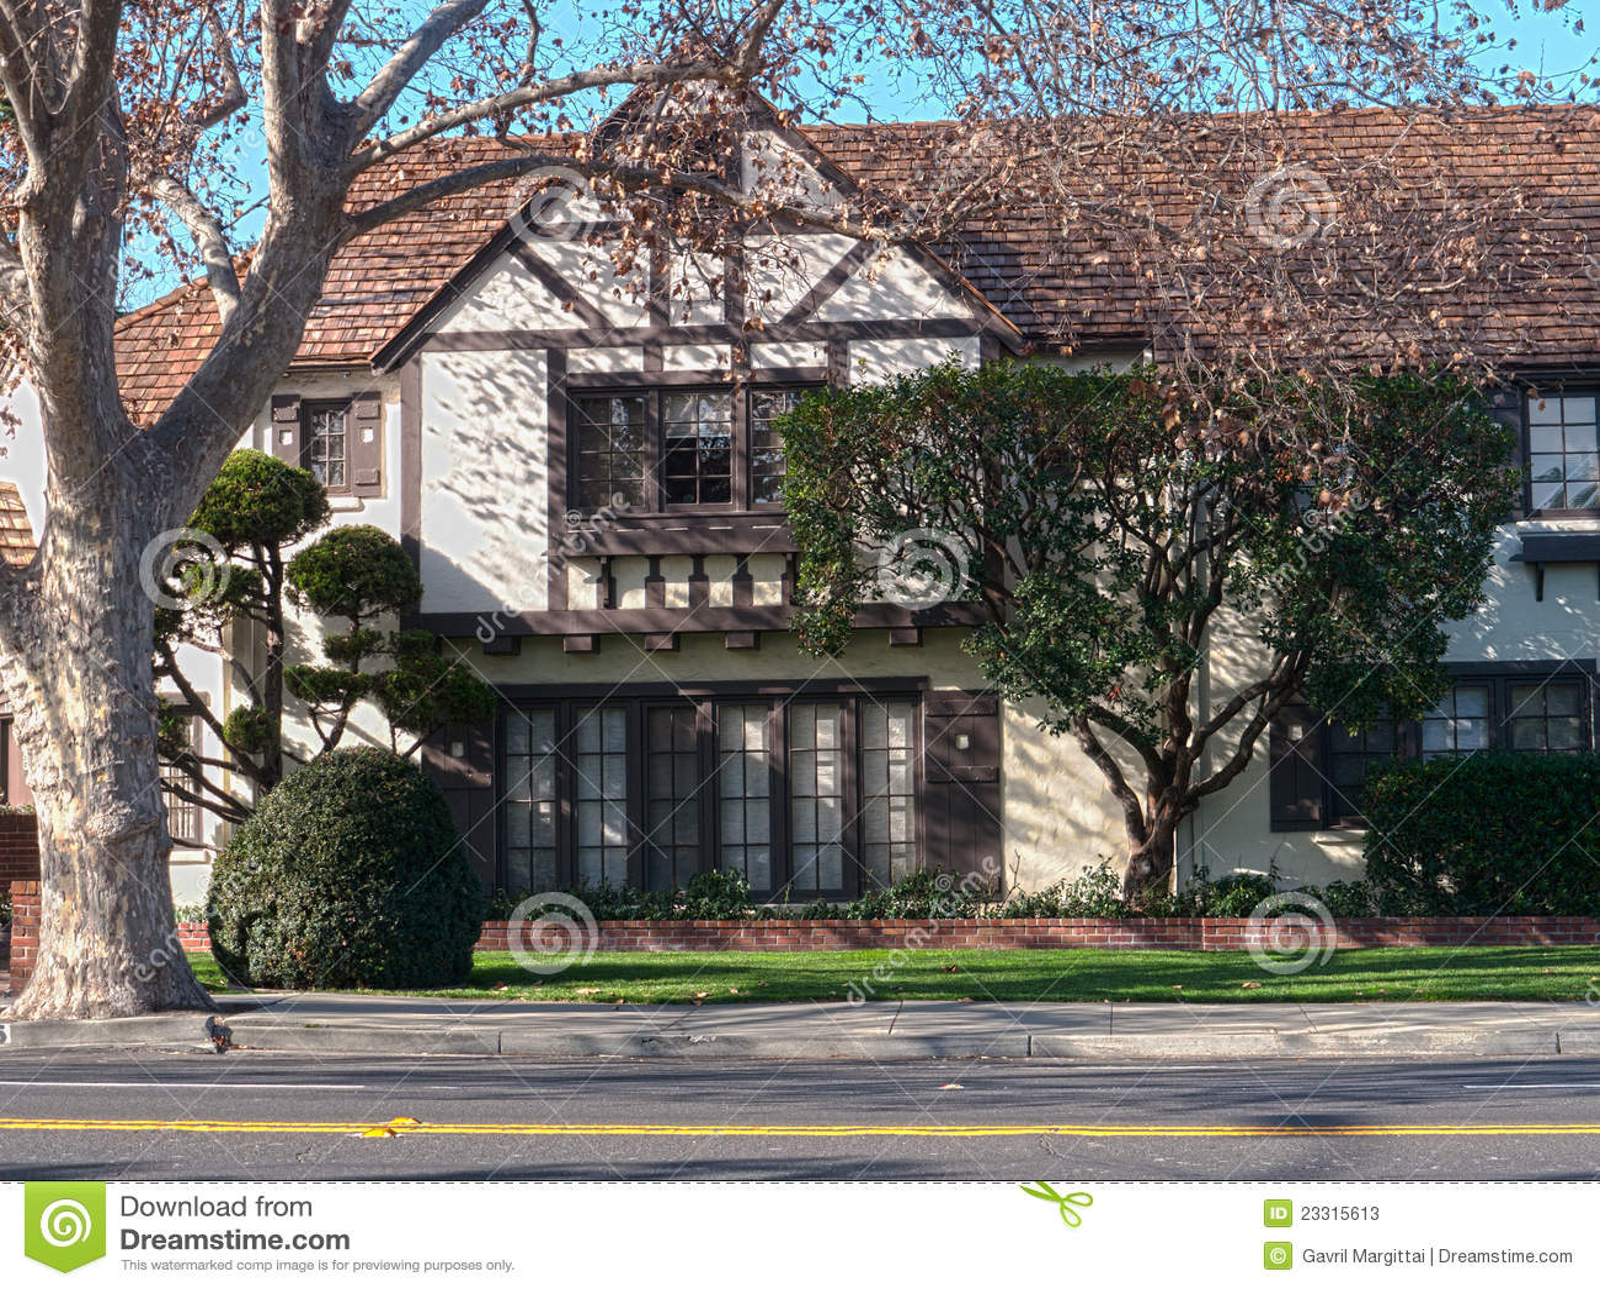 Elegant Tudor Style Victorian House Stock Photos Image